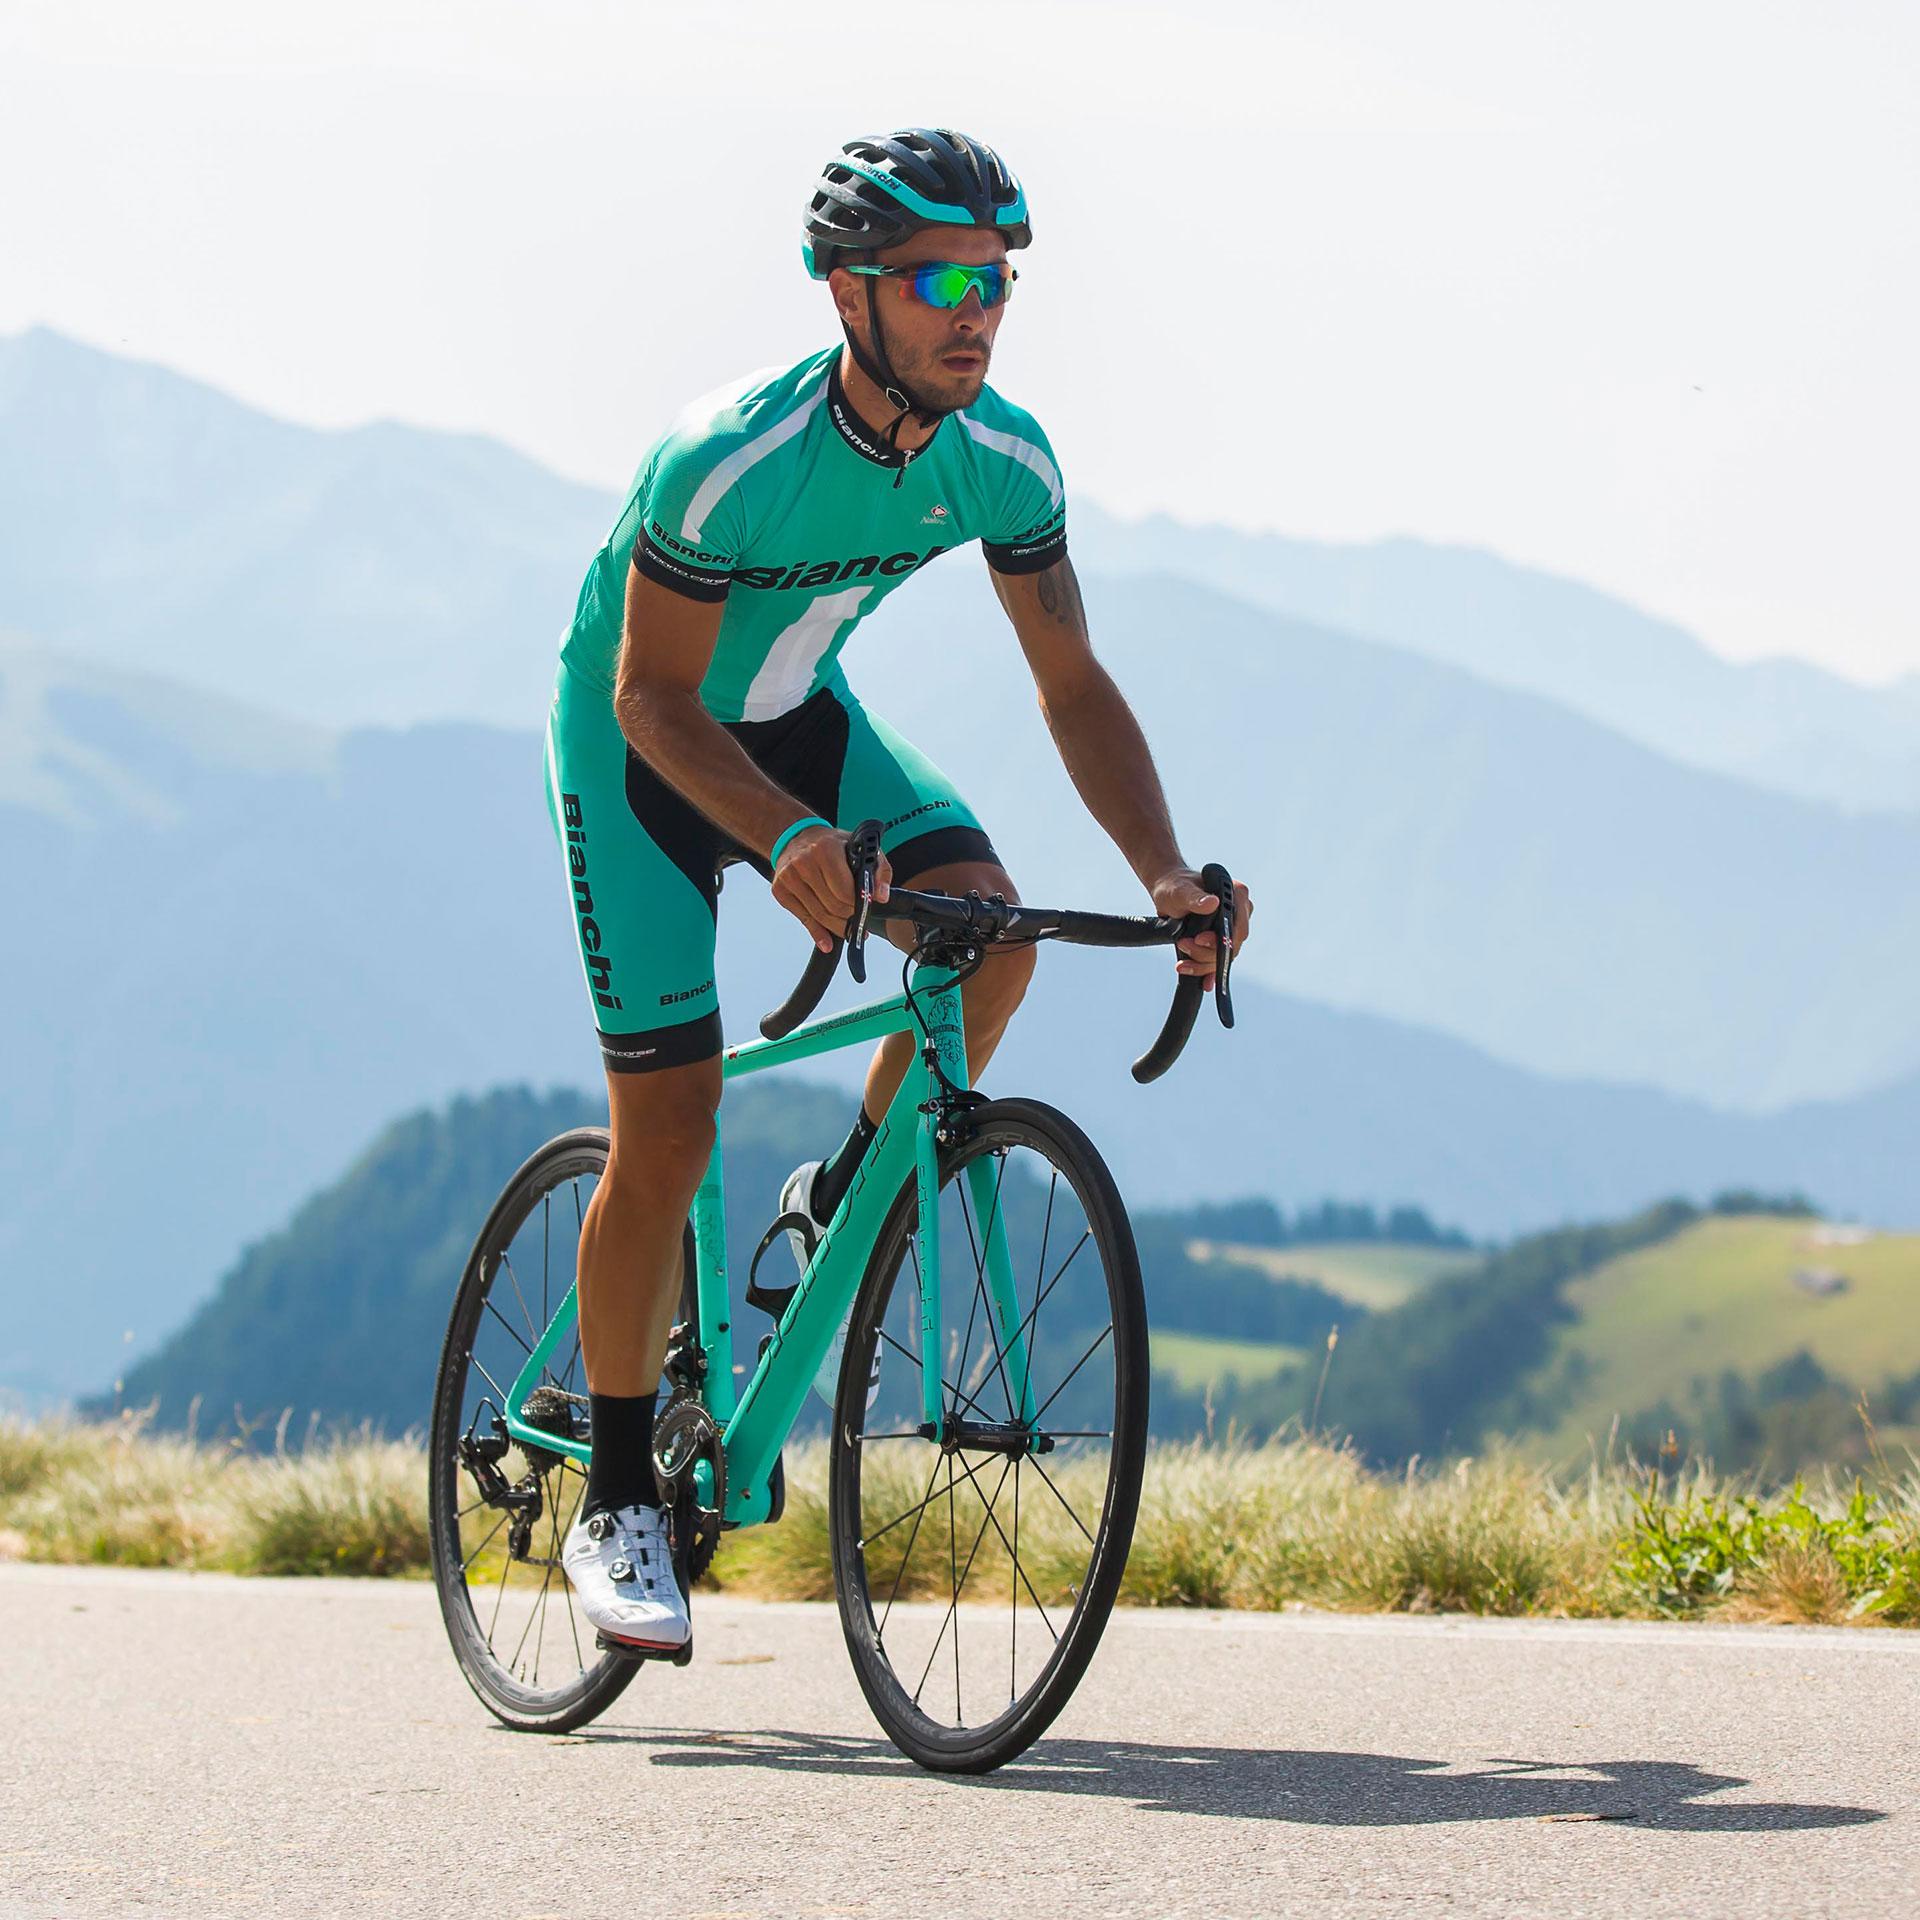 Bianchi Specialissima Road Bike